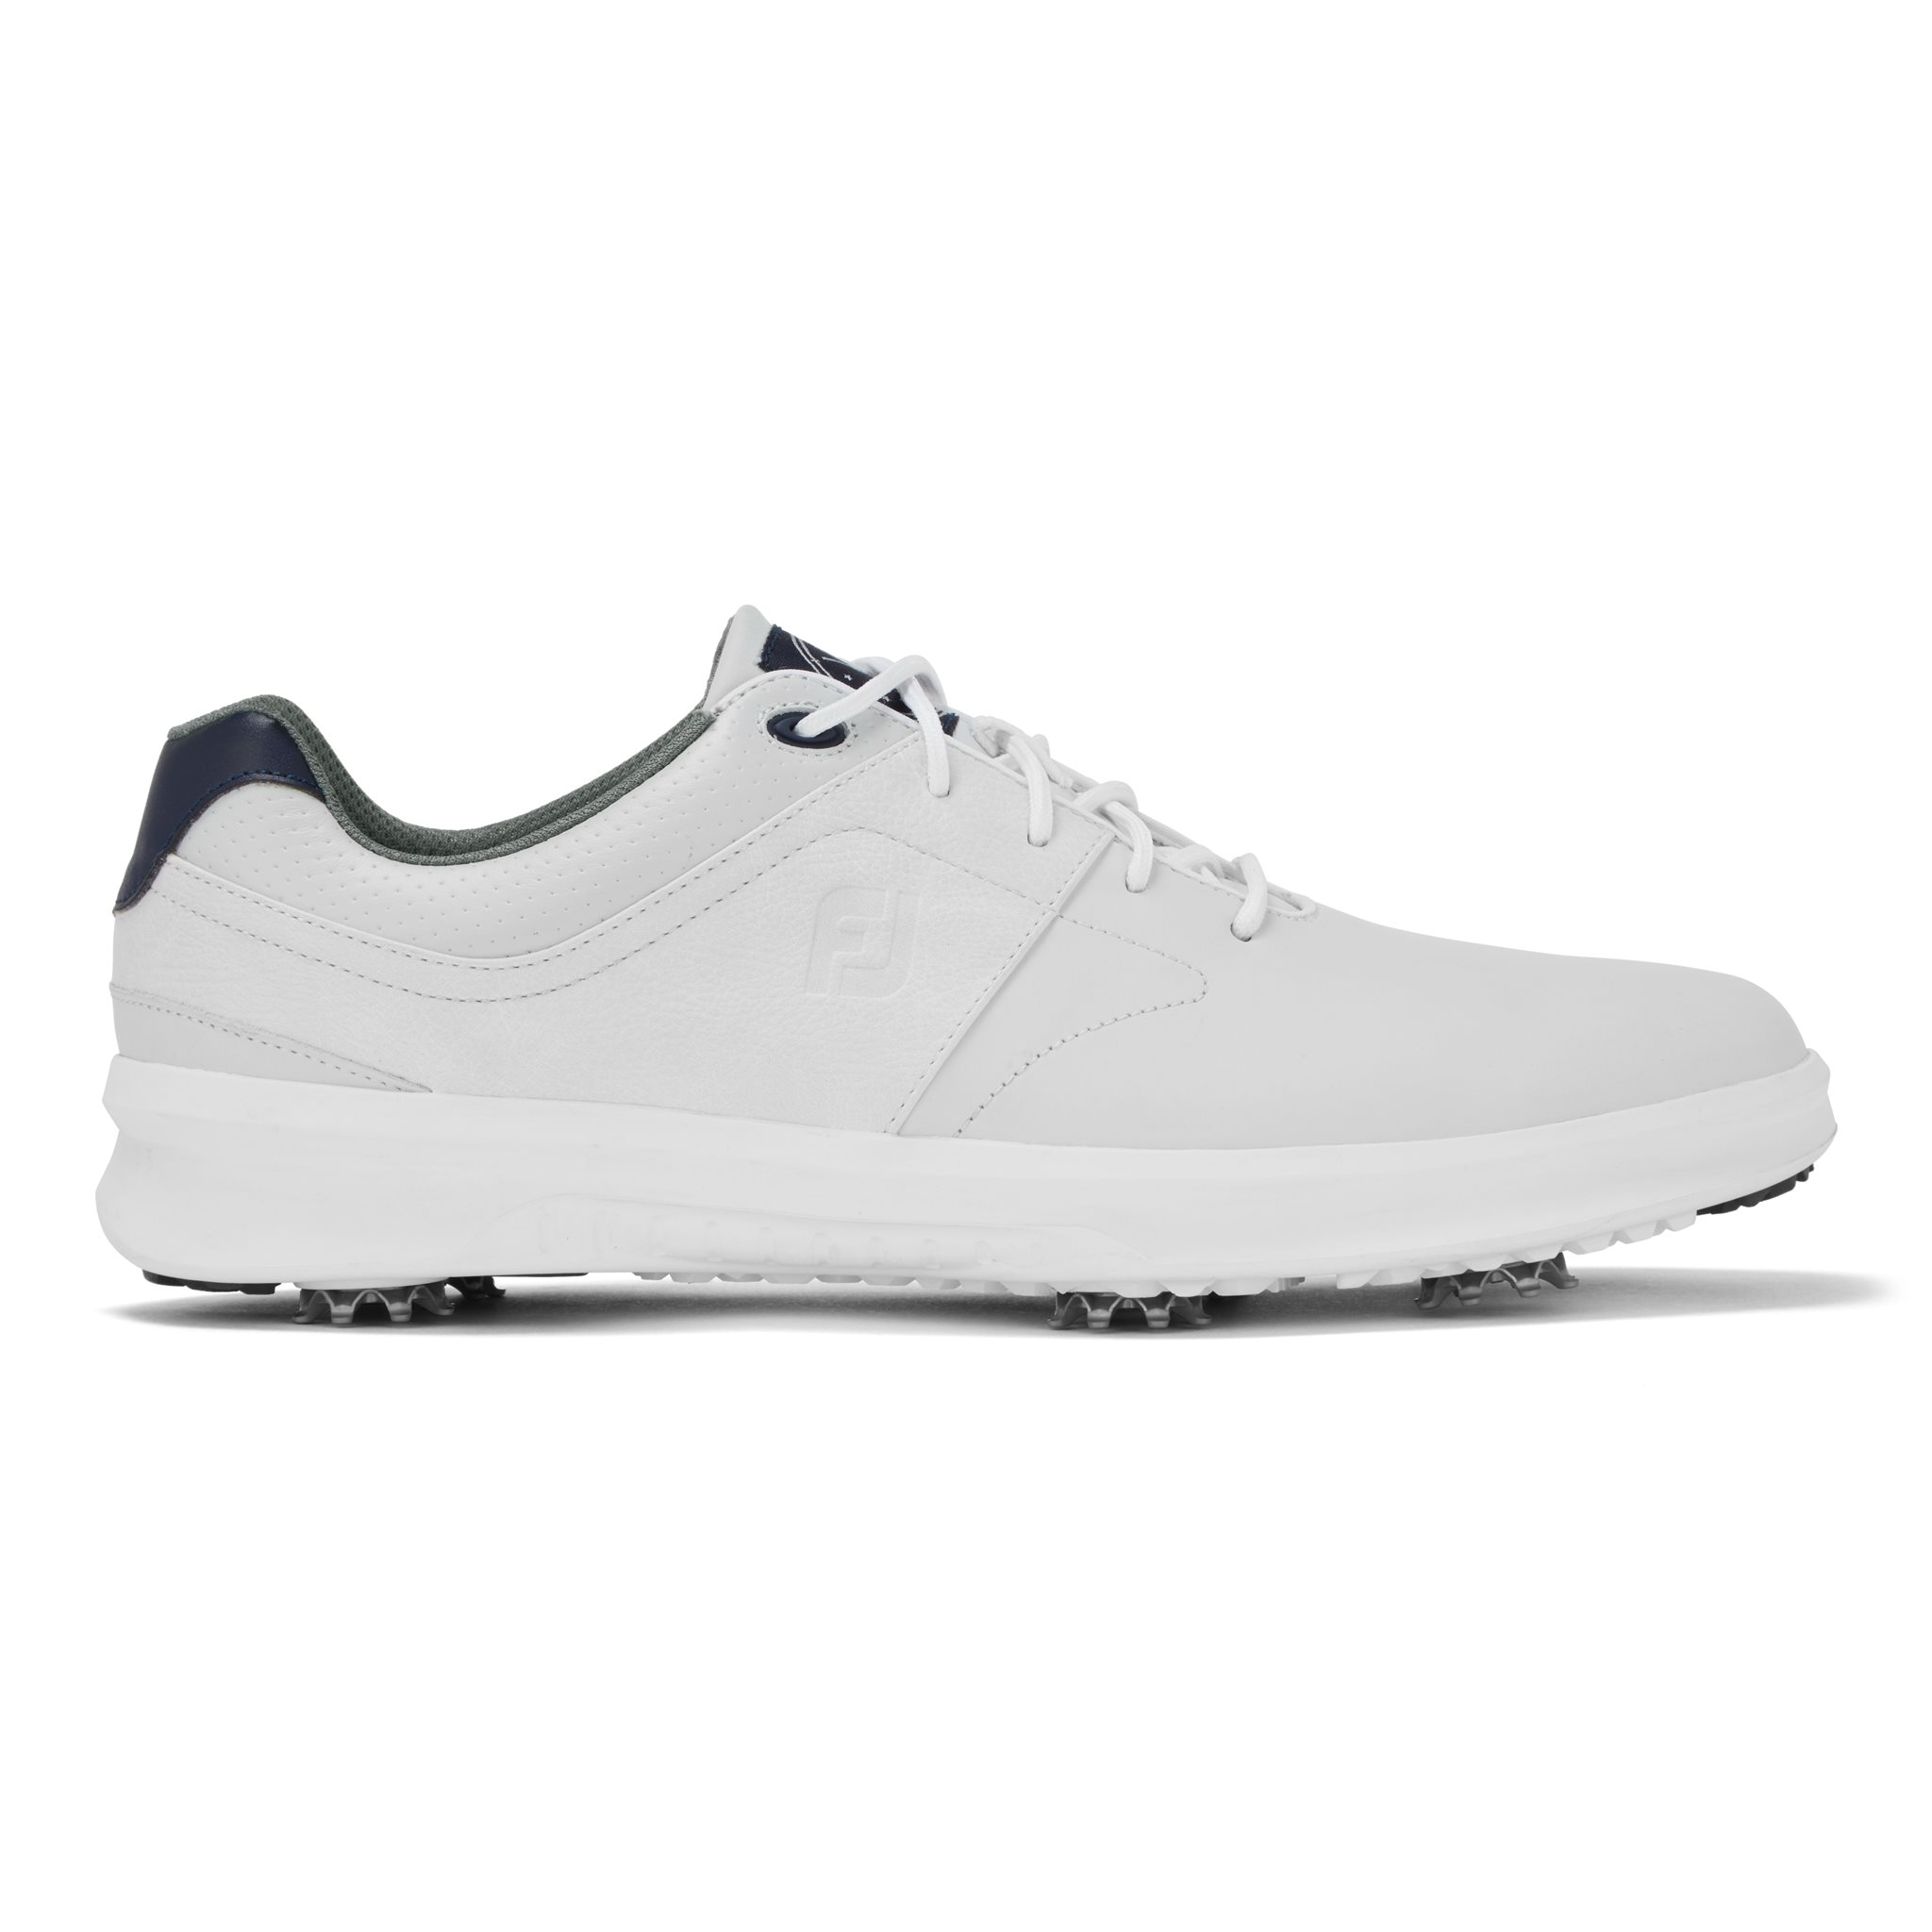 FootJoy heren golfschoenen Contour WIDE wit